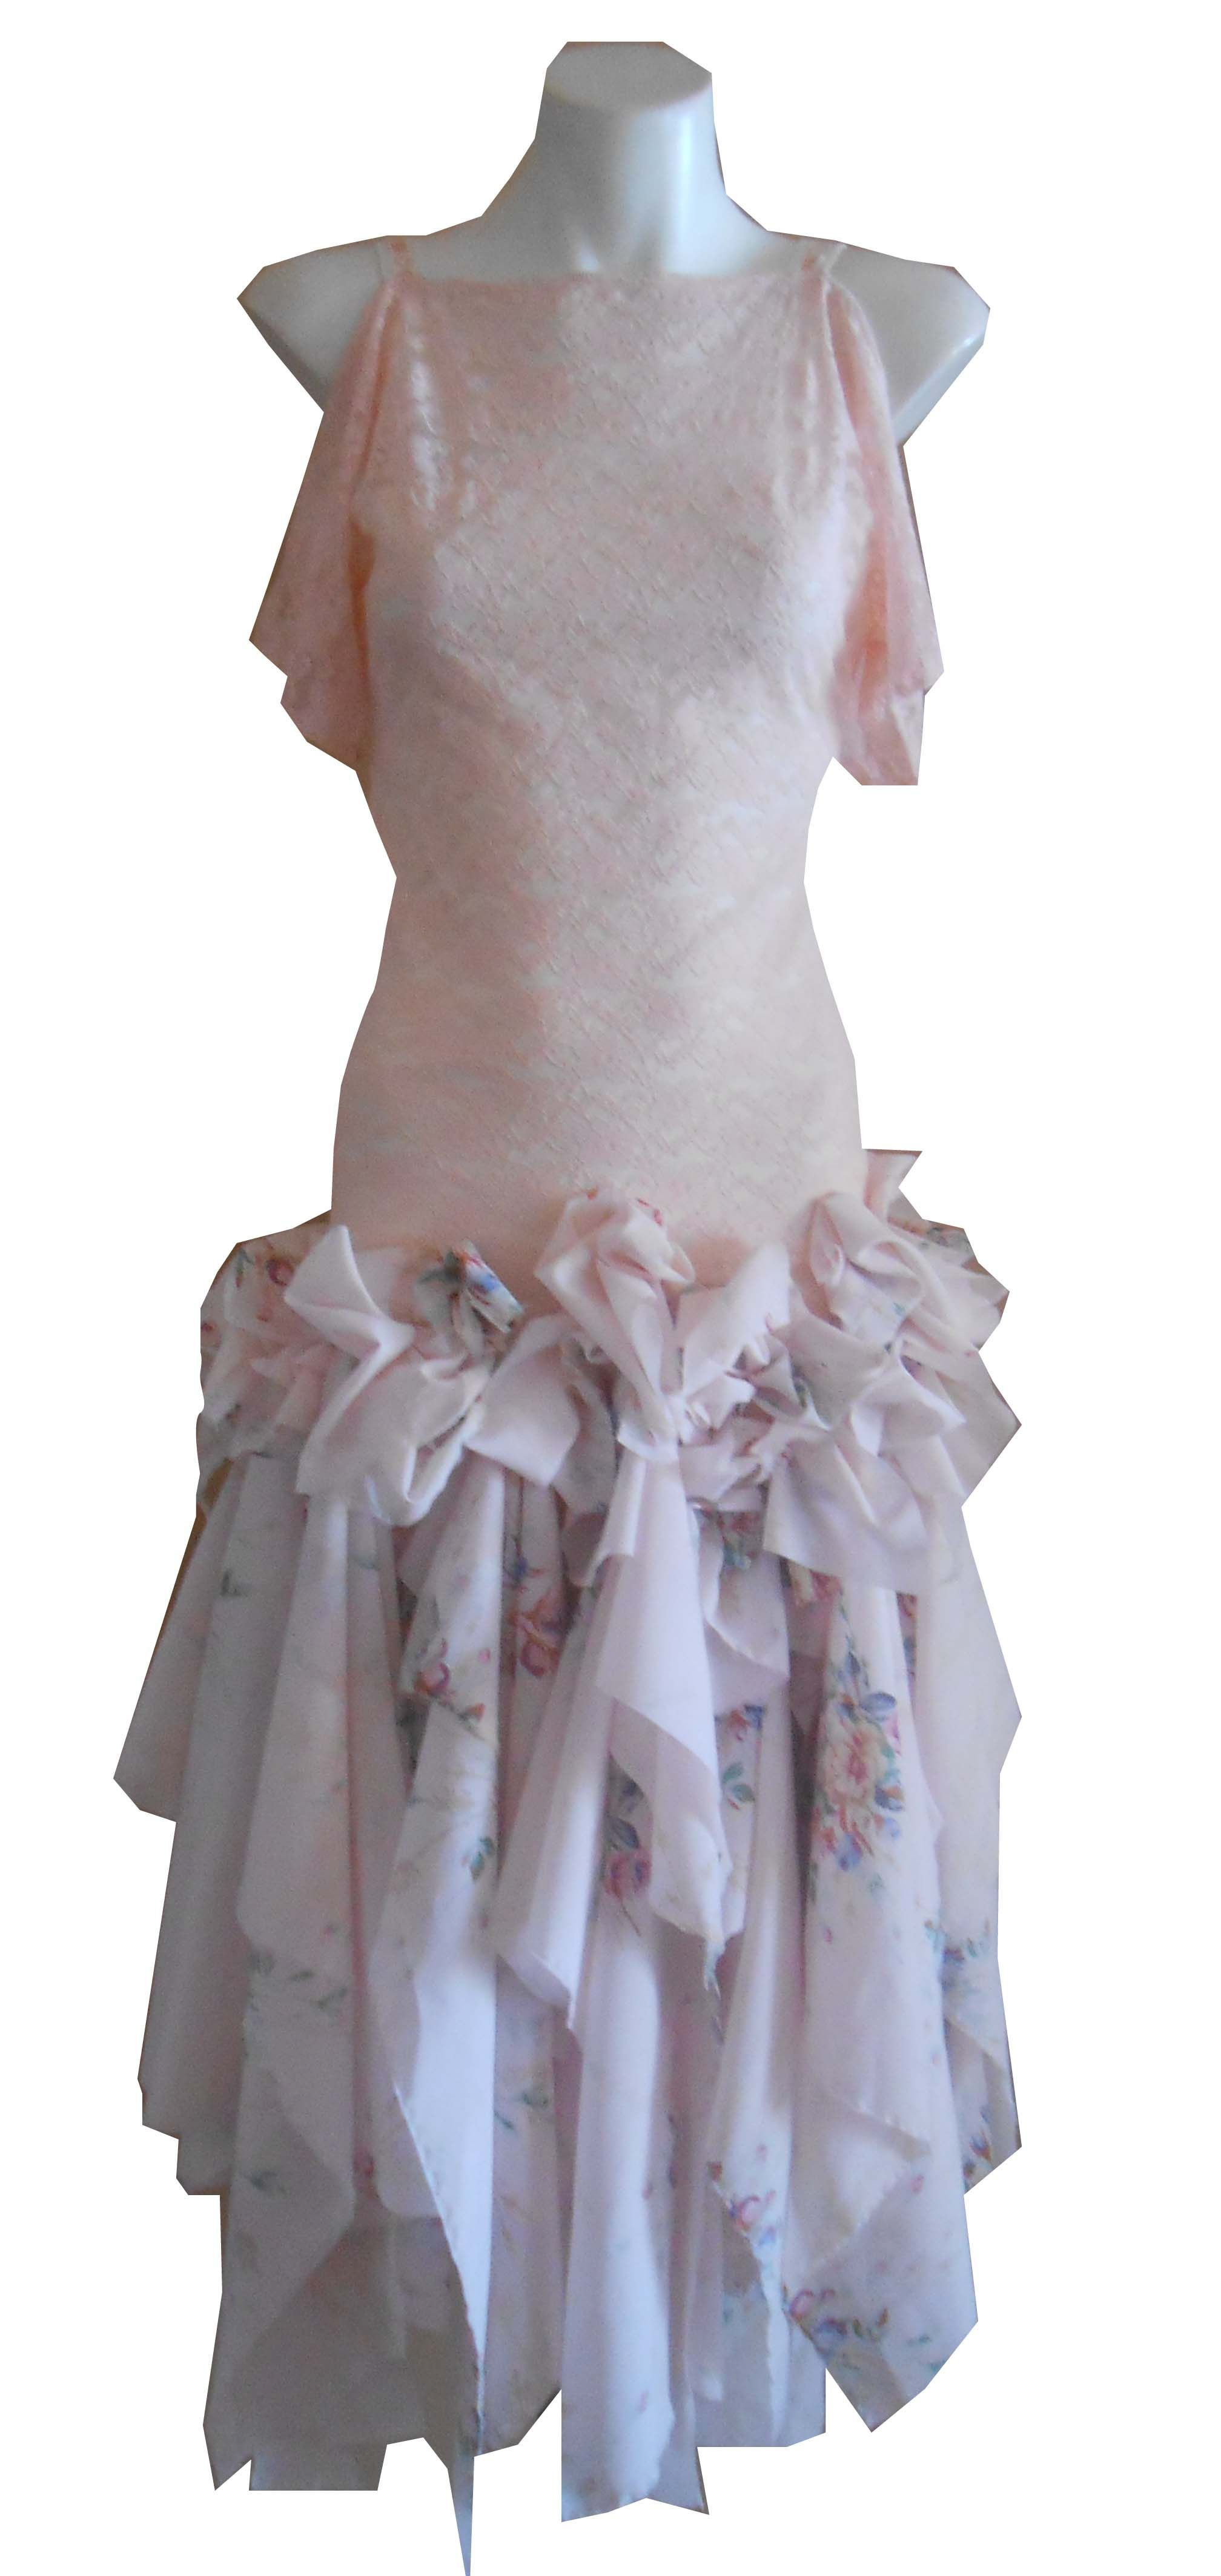 HARAH DESIGNS VINTAGE BLOSSOM BABE DRESS